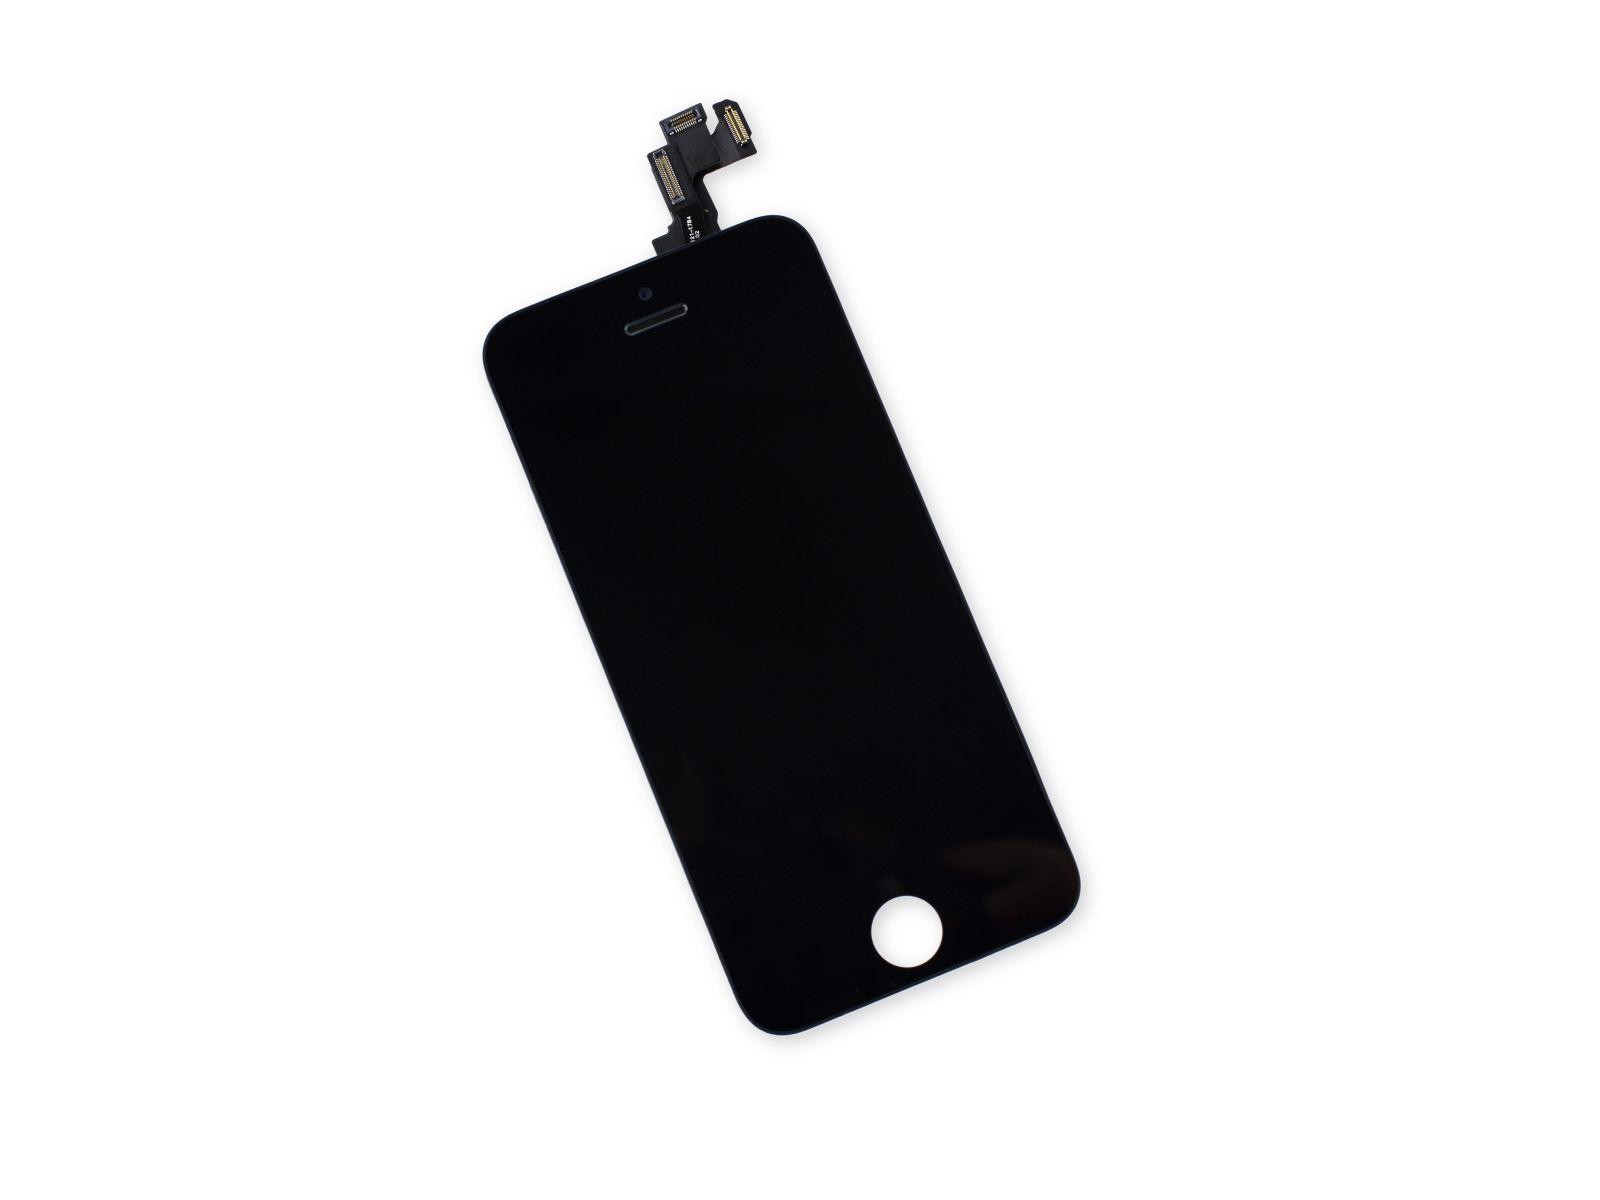 Замена сенсорного стекла и дисплея на iPhone 5S (1)